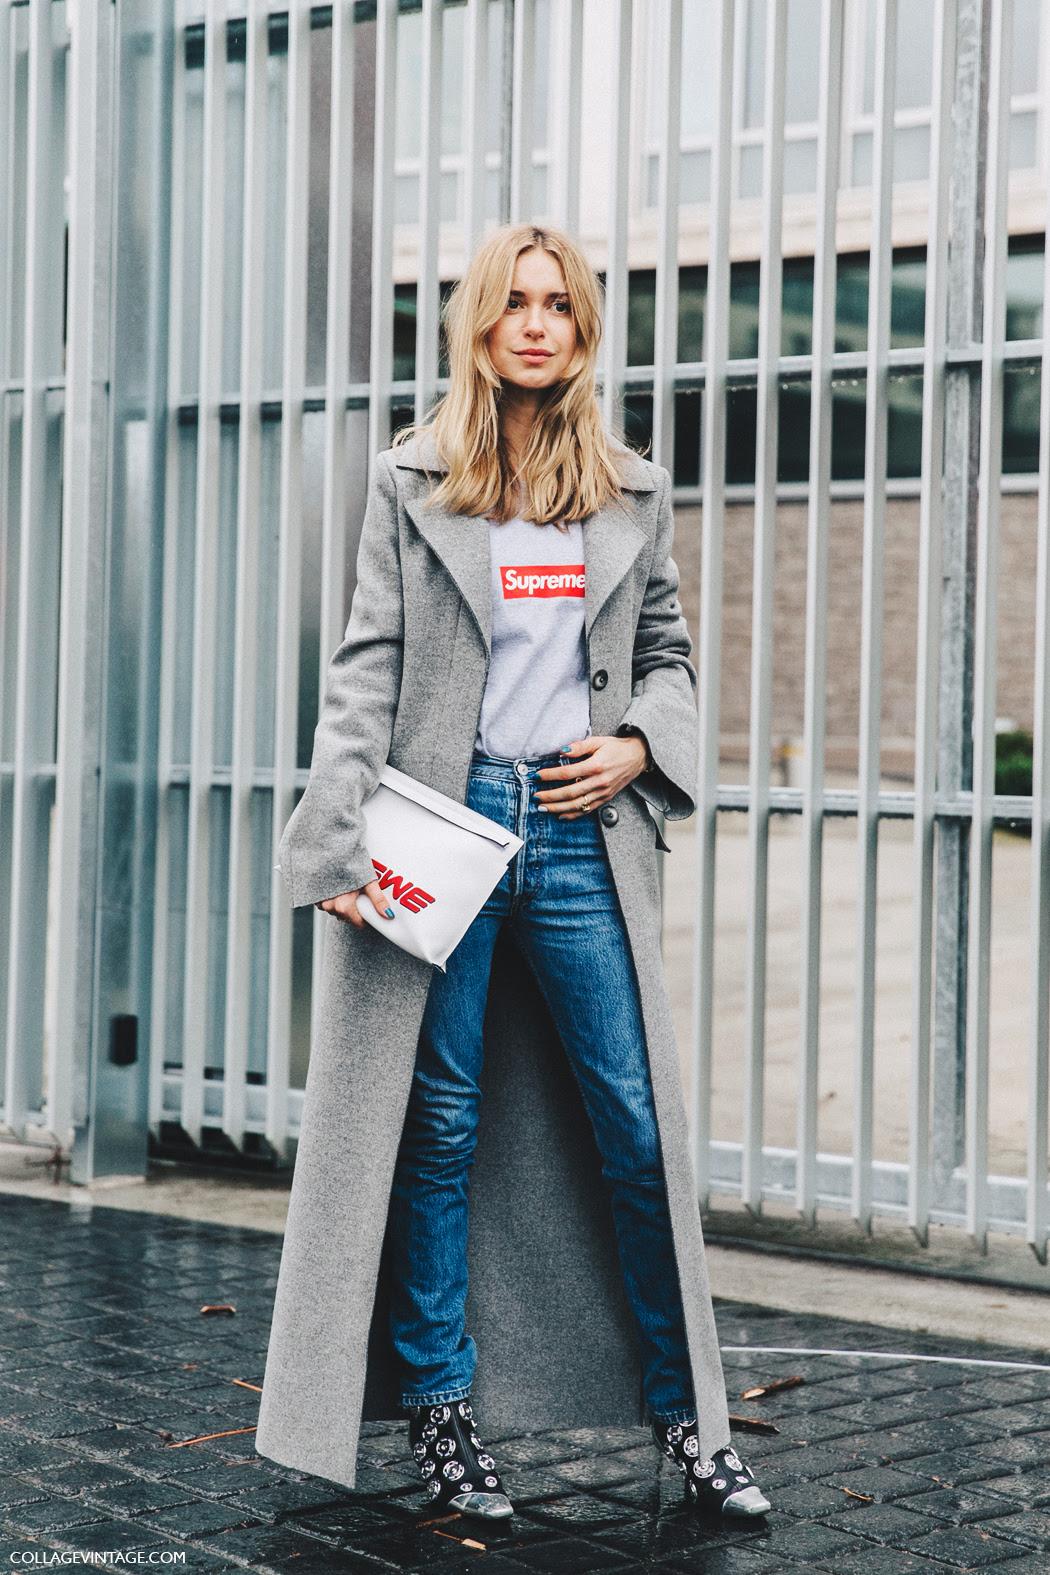 PFW-Paris_Fashion_Week_Fall_2016-Street_Style-Collage_Vintage-Pernille_Teisbaek-Long_Coat-Loewe_Cluth-Supreme_top-2